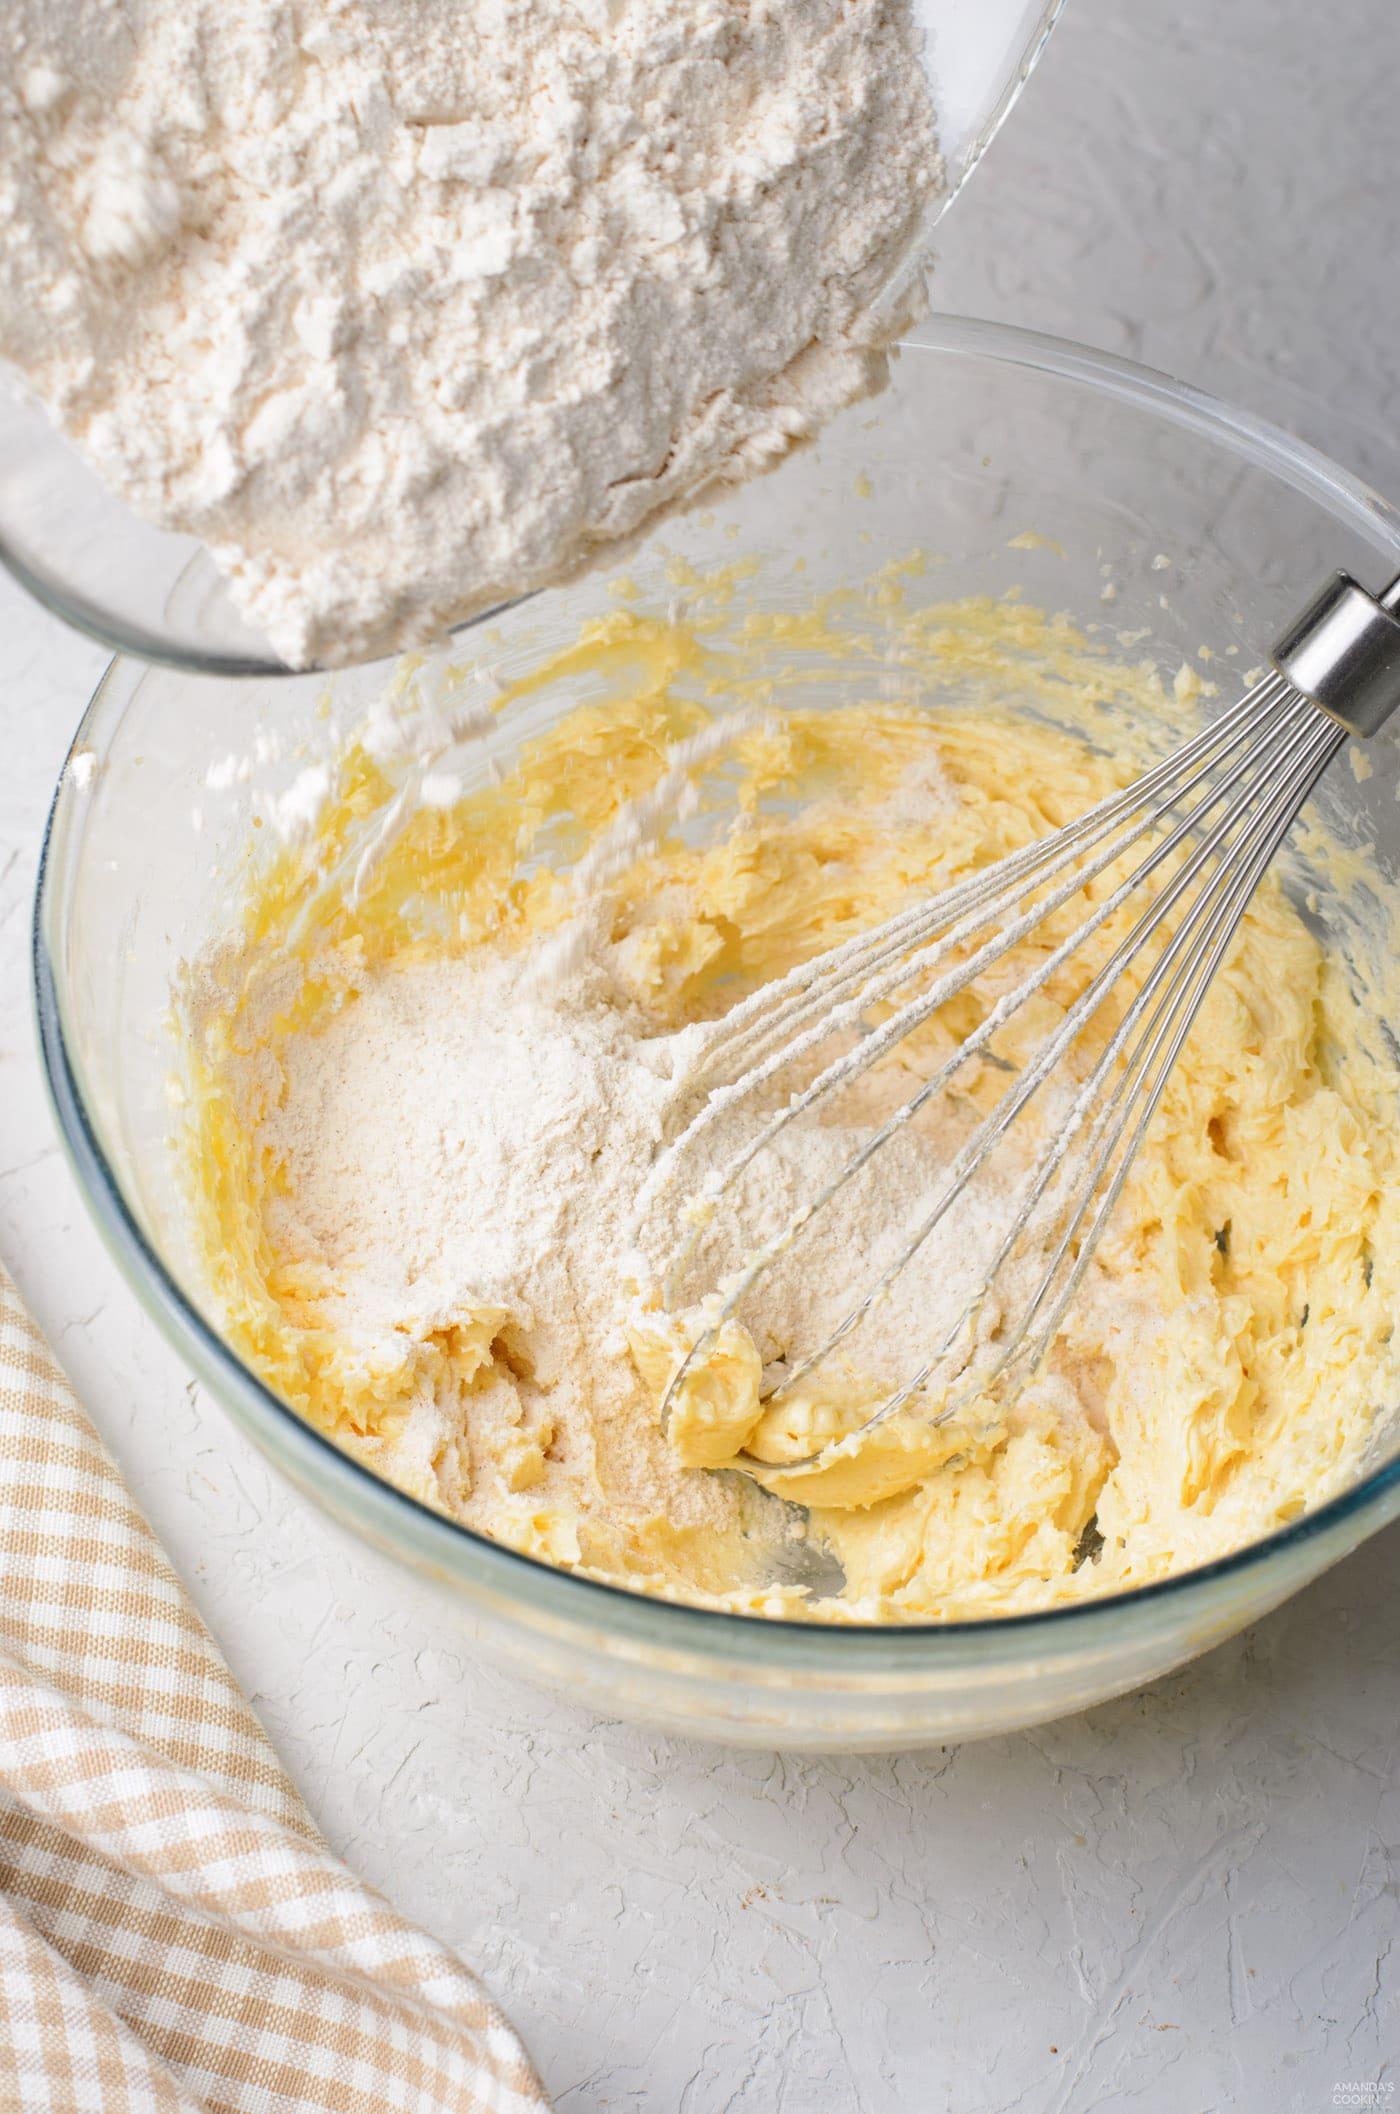 adding dry ingredients to wet ingredients